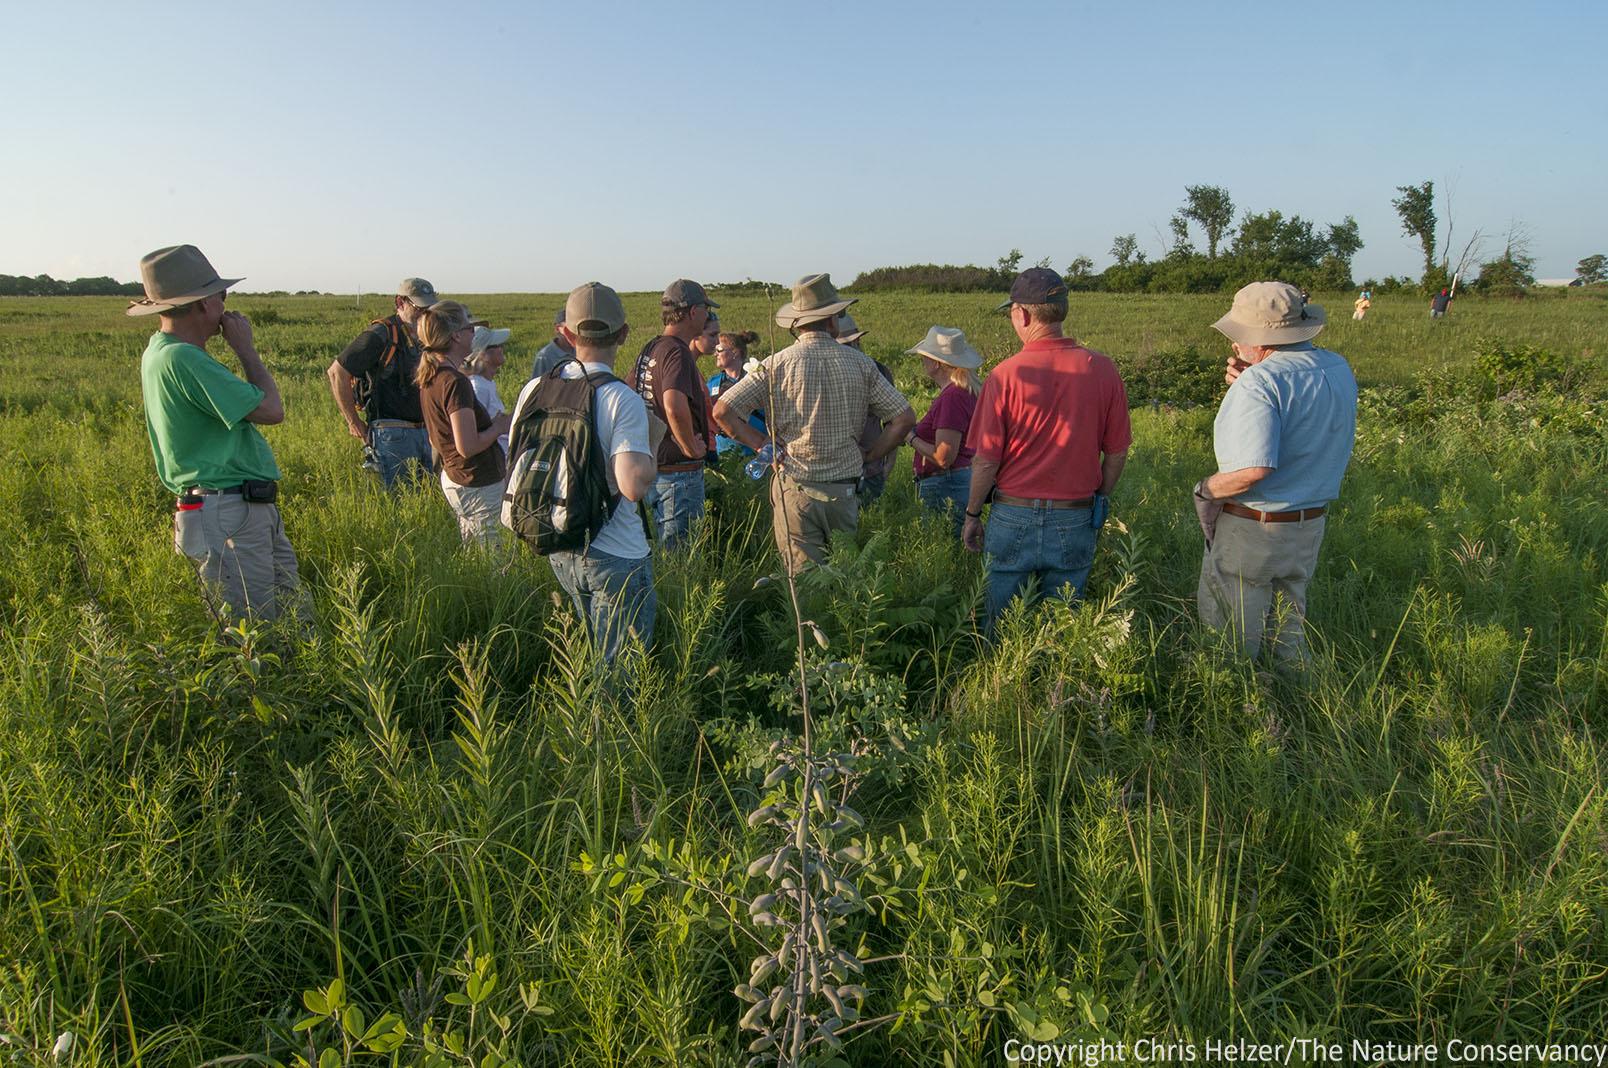 Report from the 2013 grassland restoration network workshop part 1